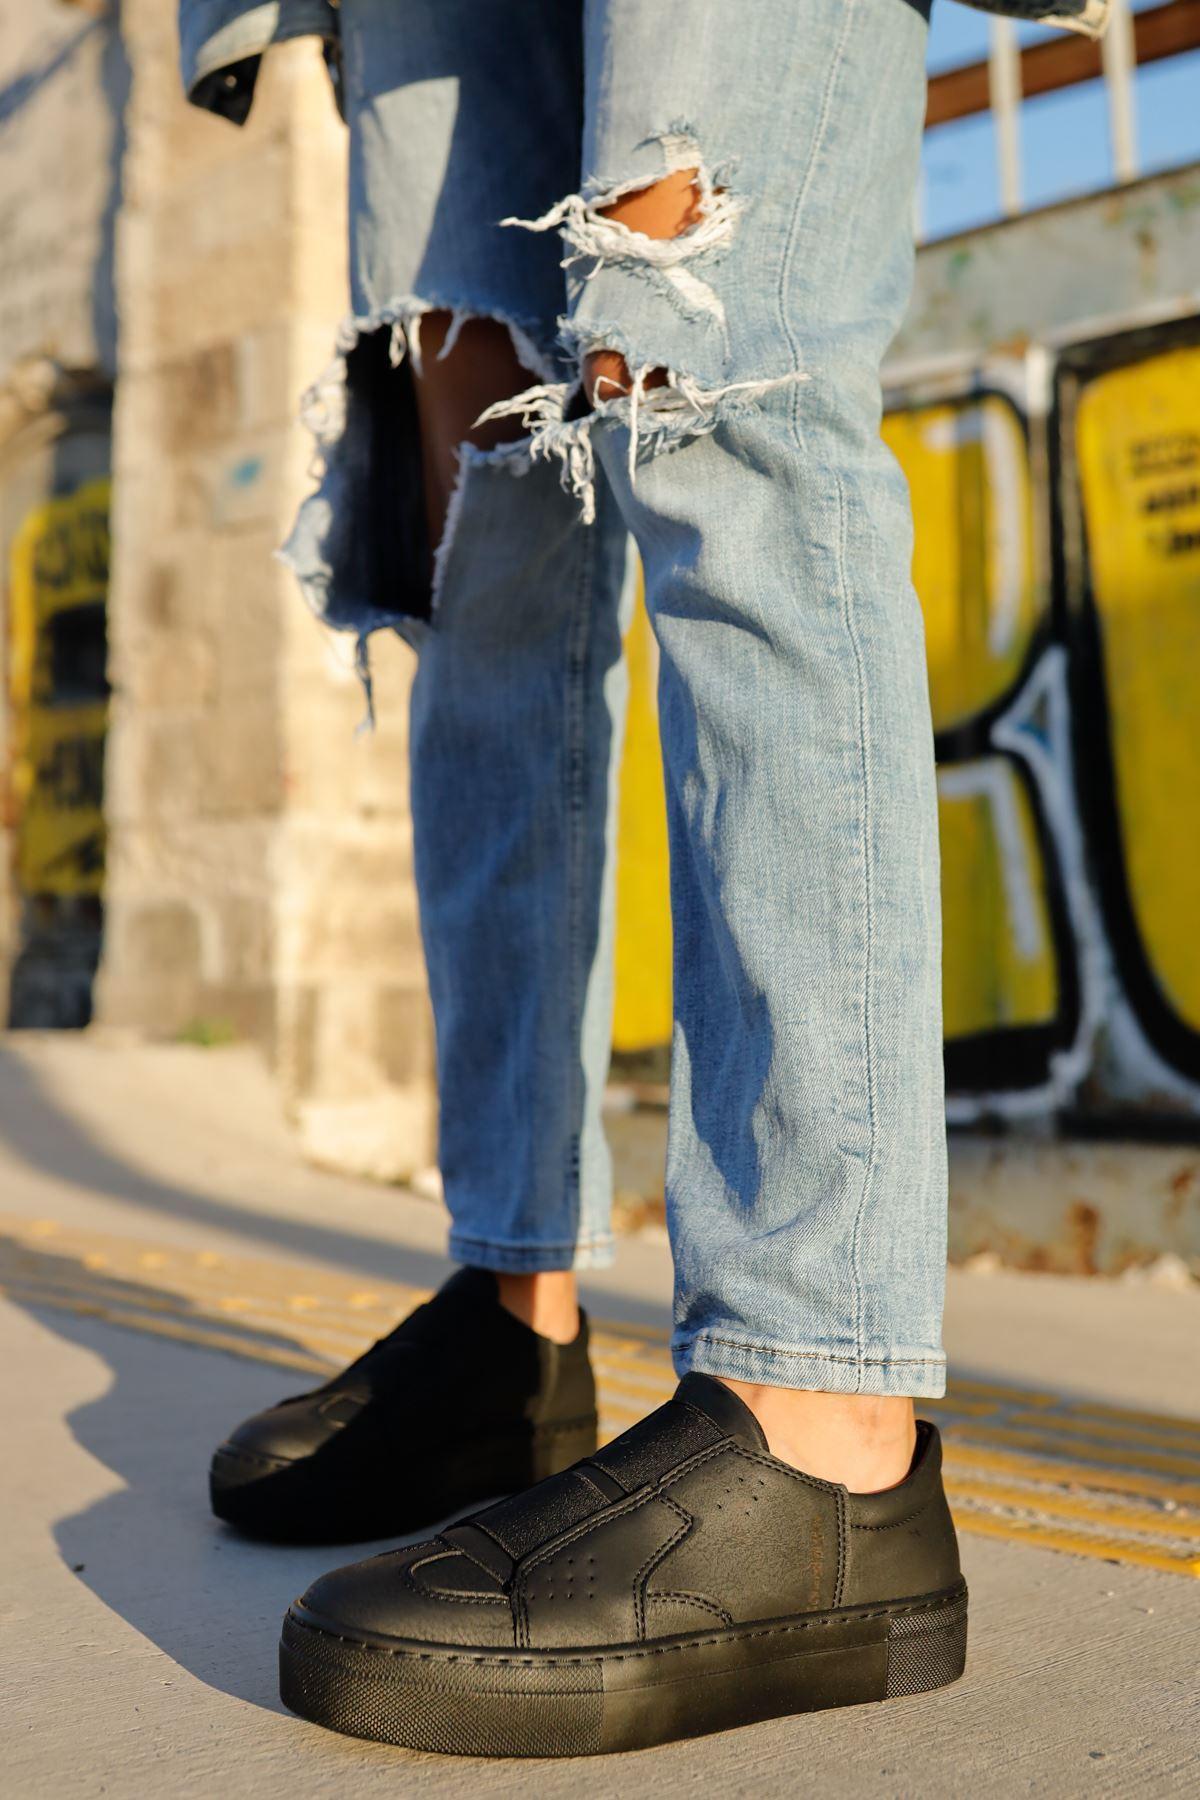 Chekich CH033 ST Kadın Ayakkabı SIYAH